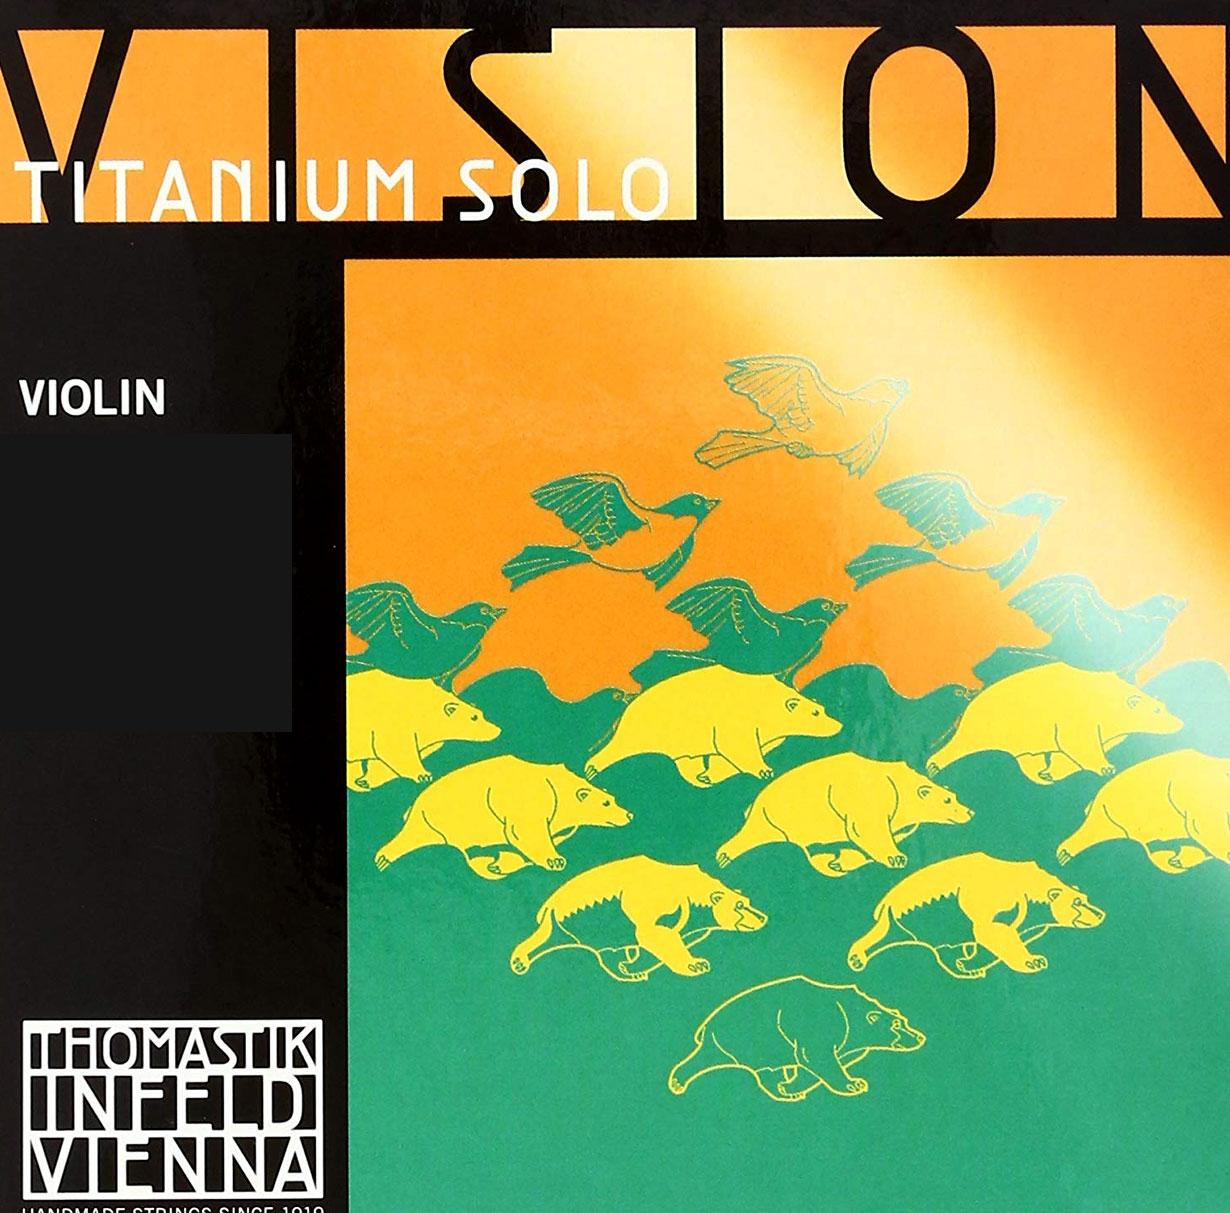 Thomastik Infeld Vision Titanium Violin D String